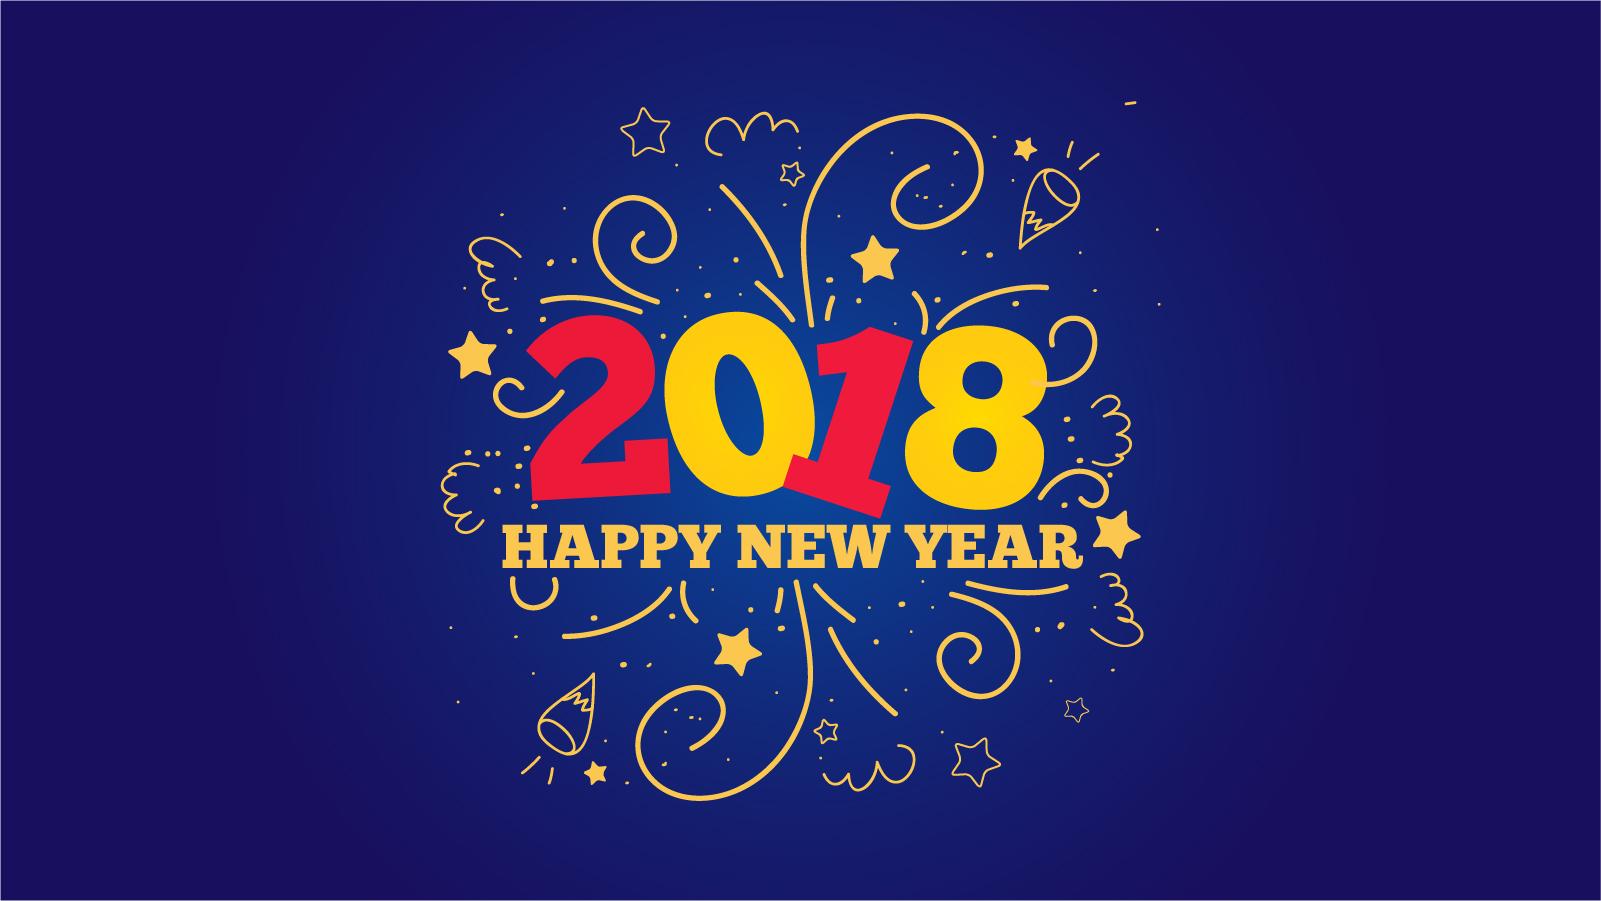 Happy-New-Year-2018-DP